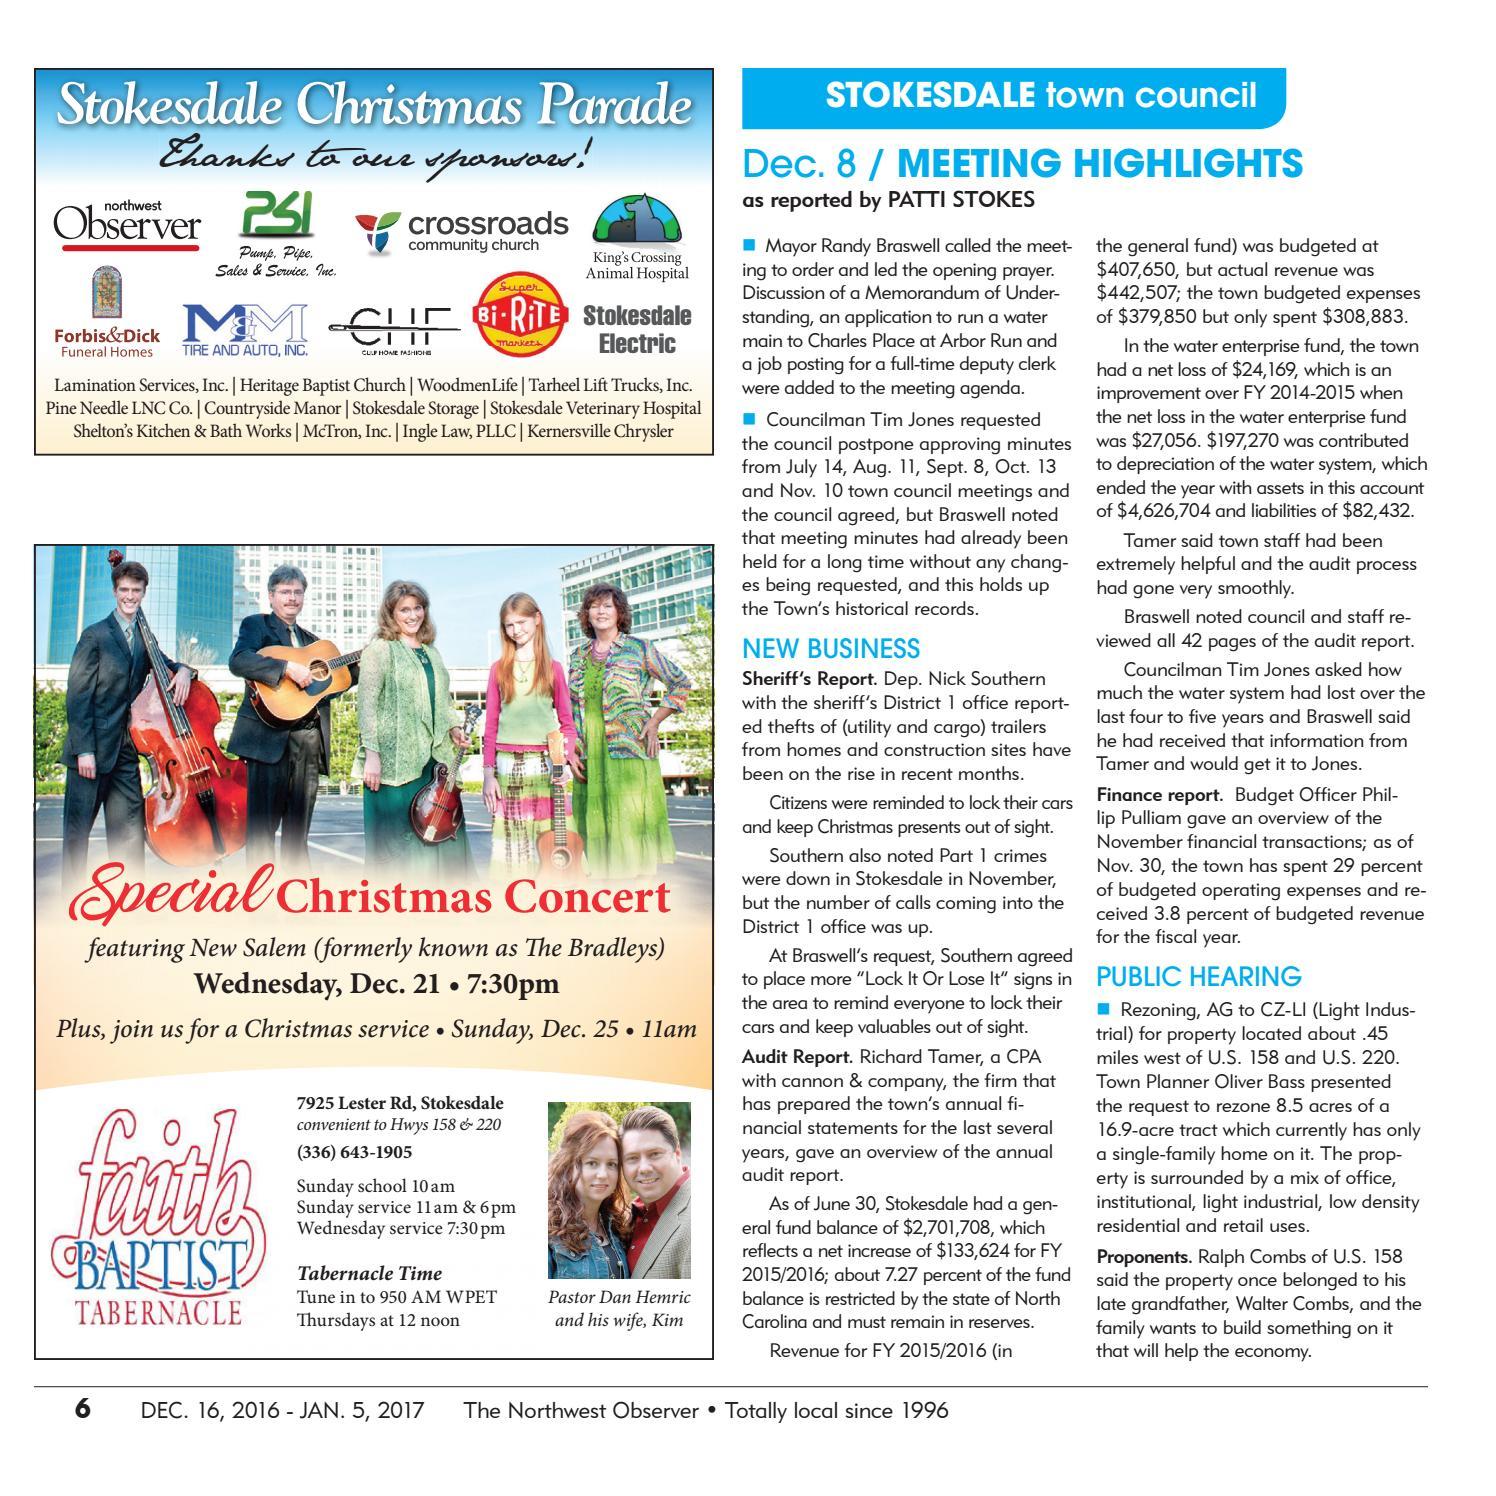 Northwest Observer | Dec  16, 2016 - Jan 5, 2017 by